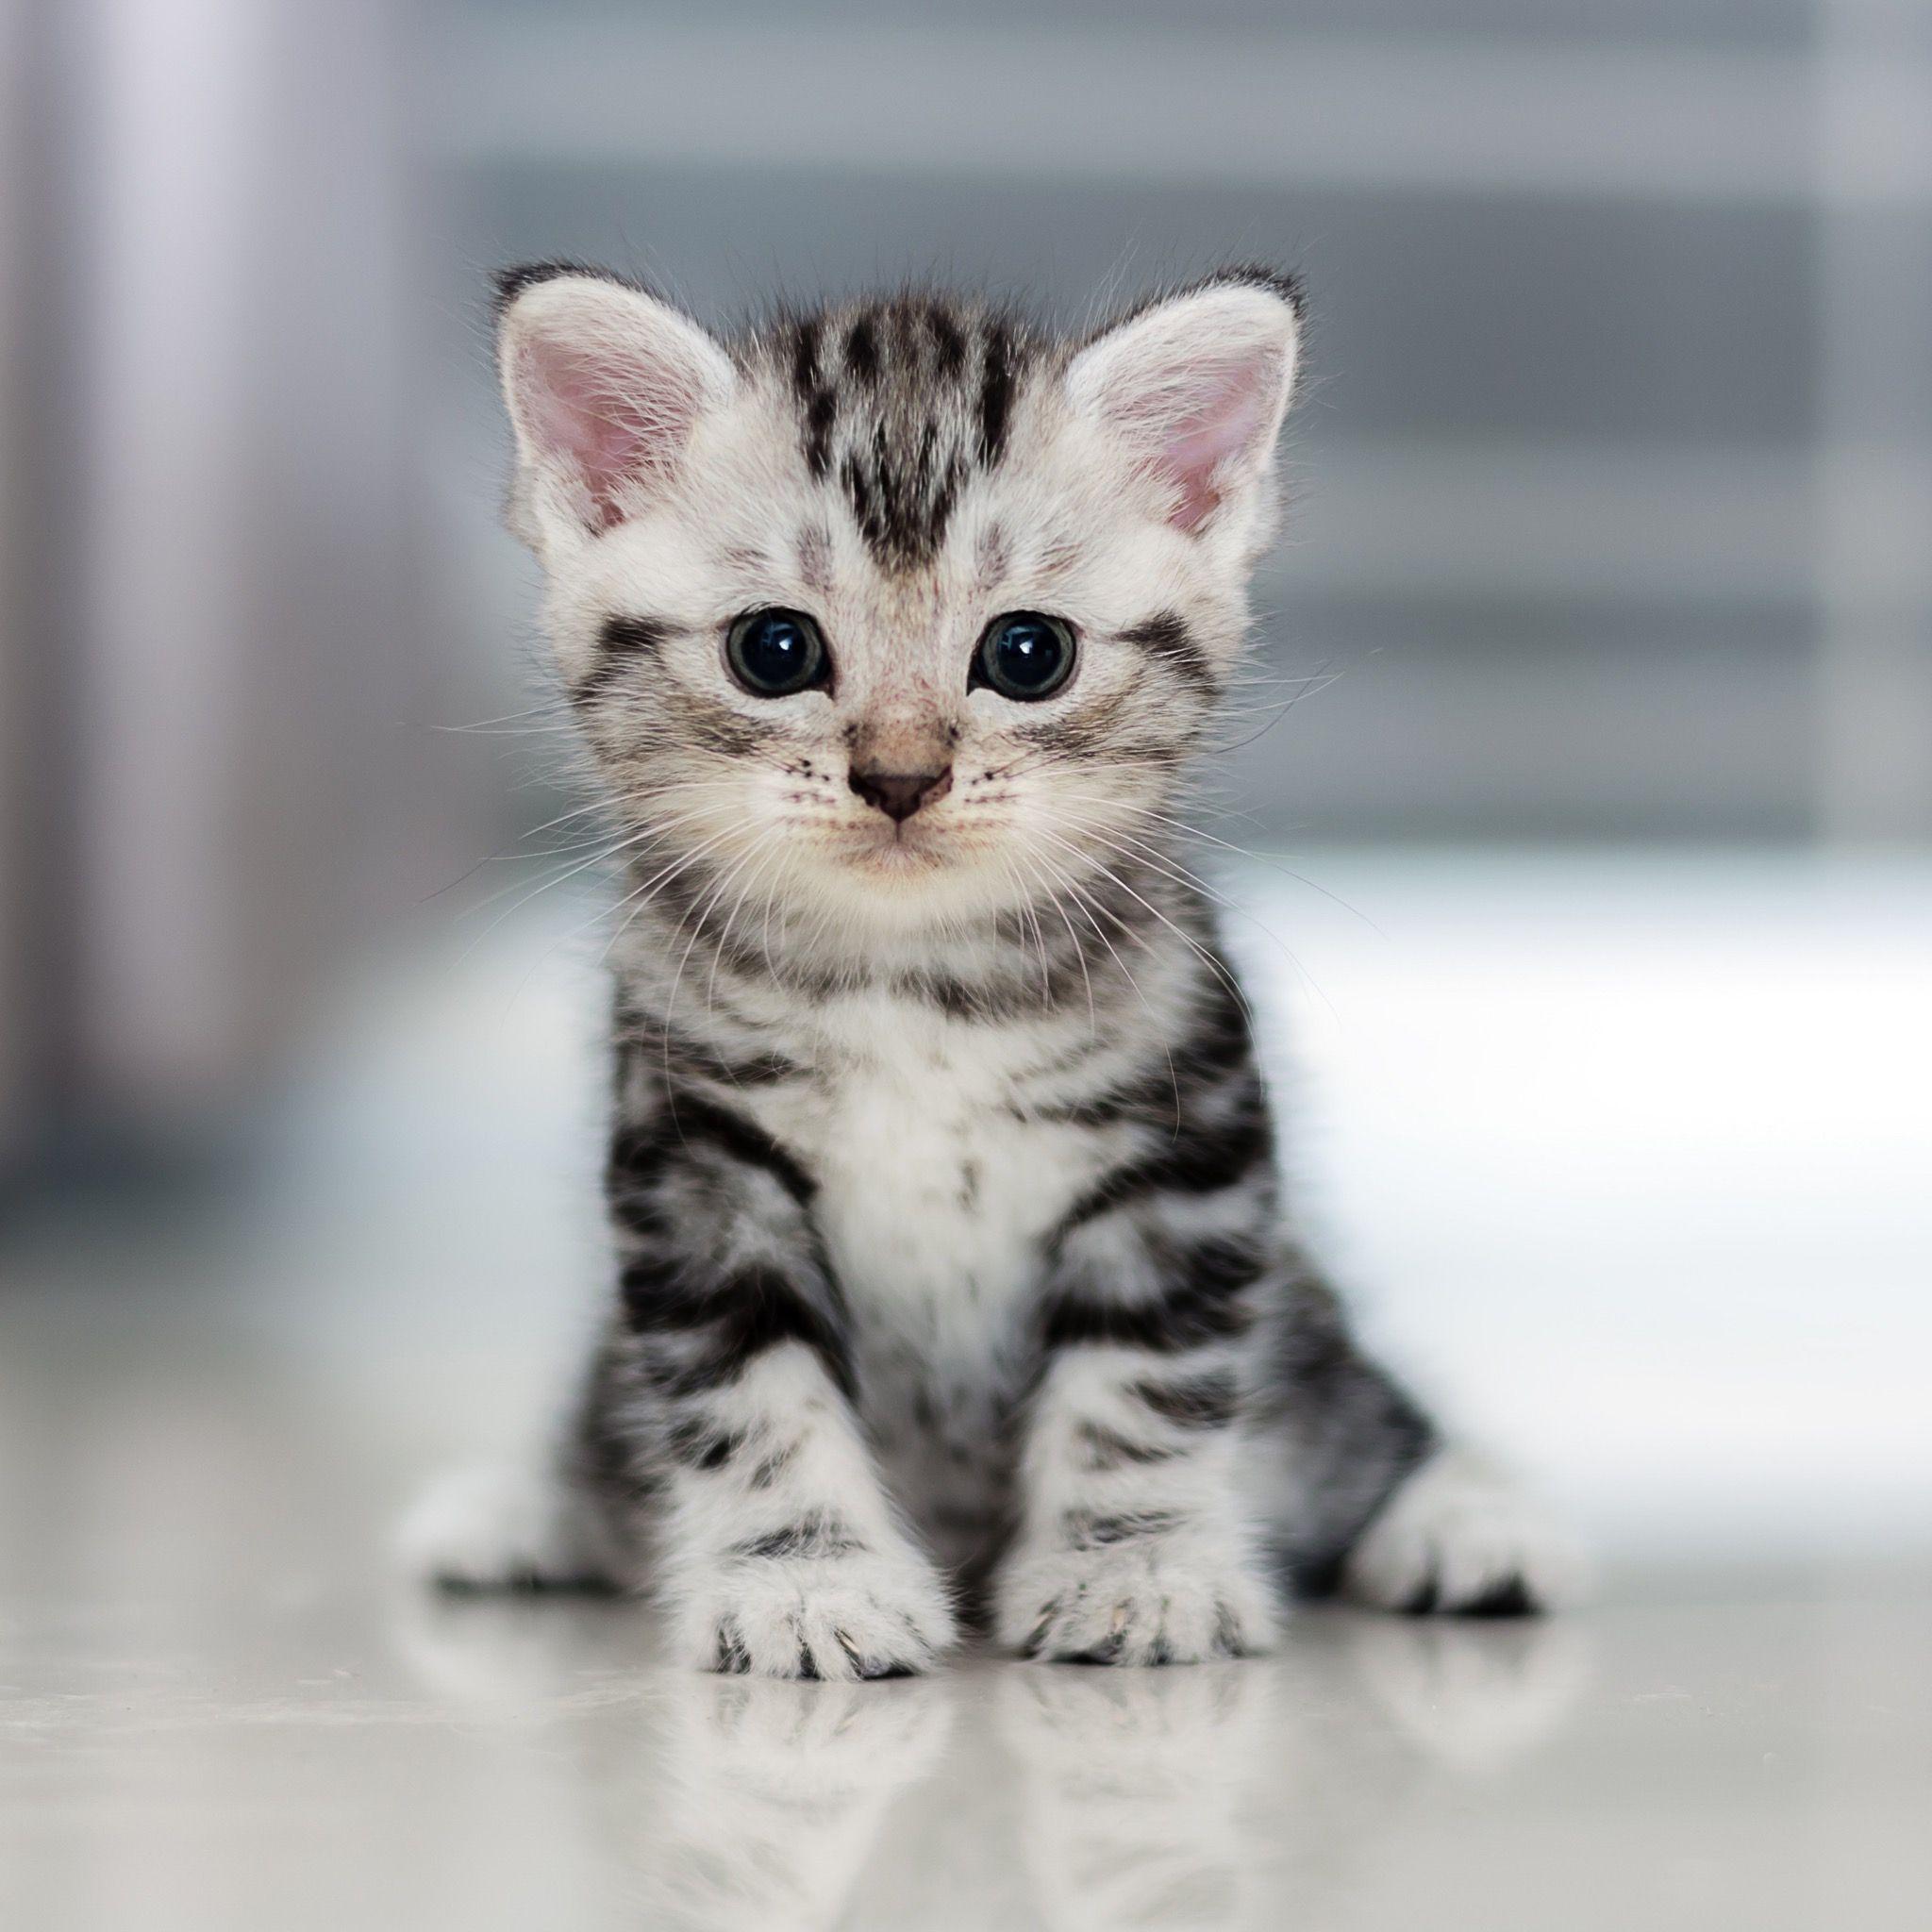 Little Darling American Shorthair Kitten Cute Cat Breeds